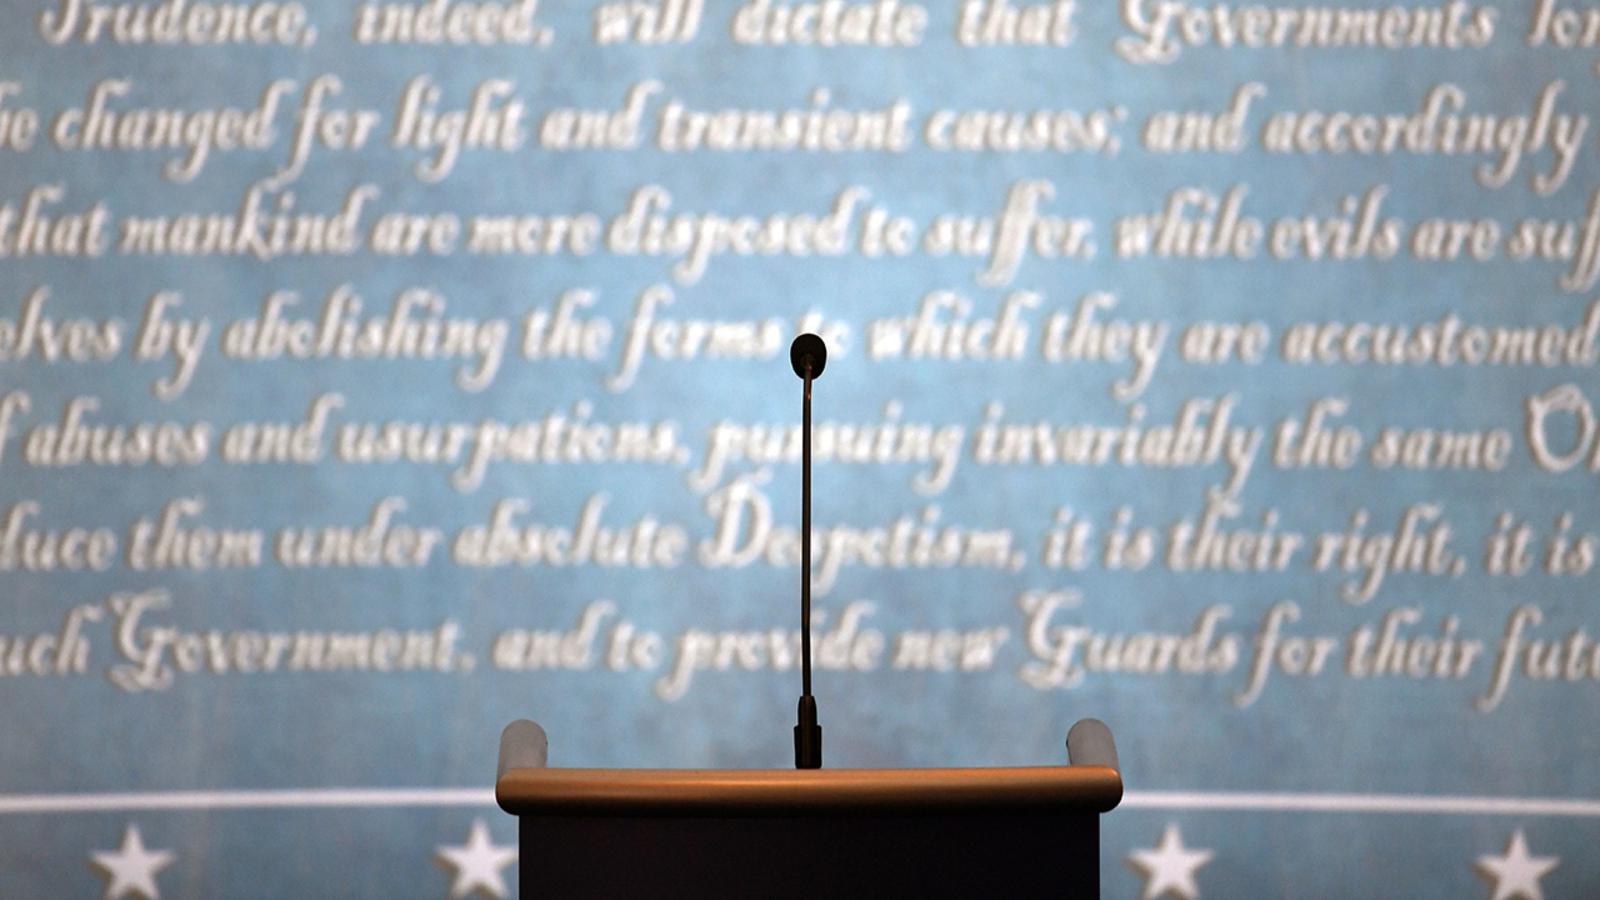 Presidential Debate Schedule In Biden Trump 2020 Election What We Know About Tonight Abc11 Raleigh Durham